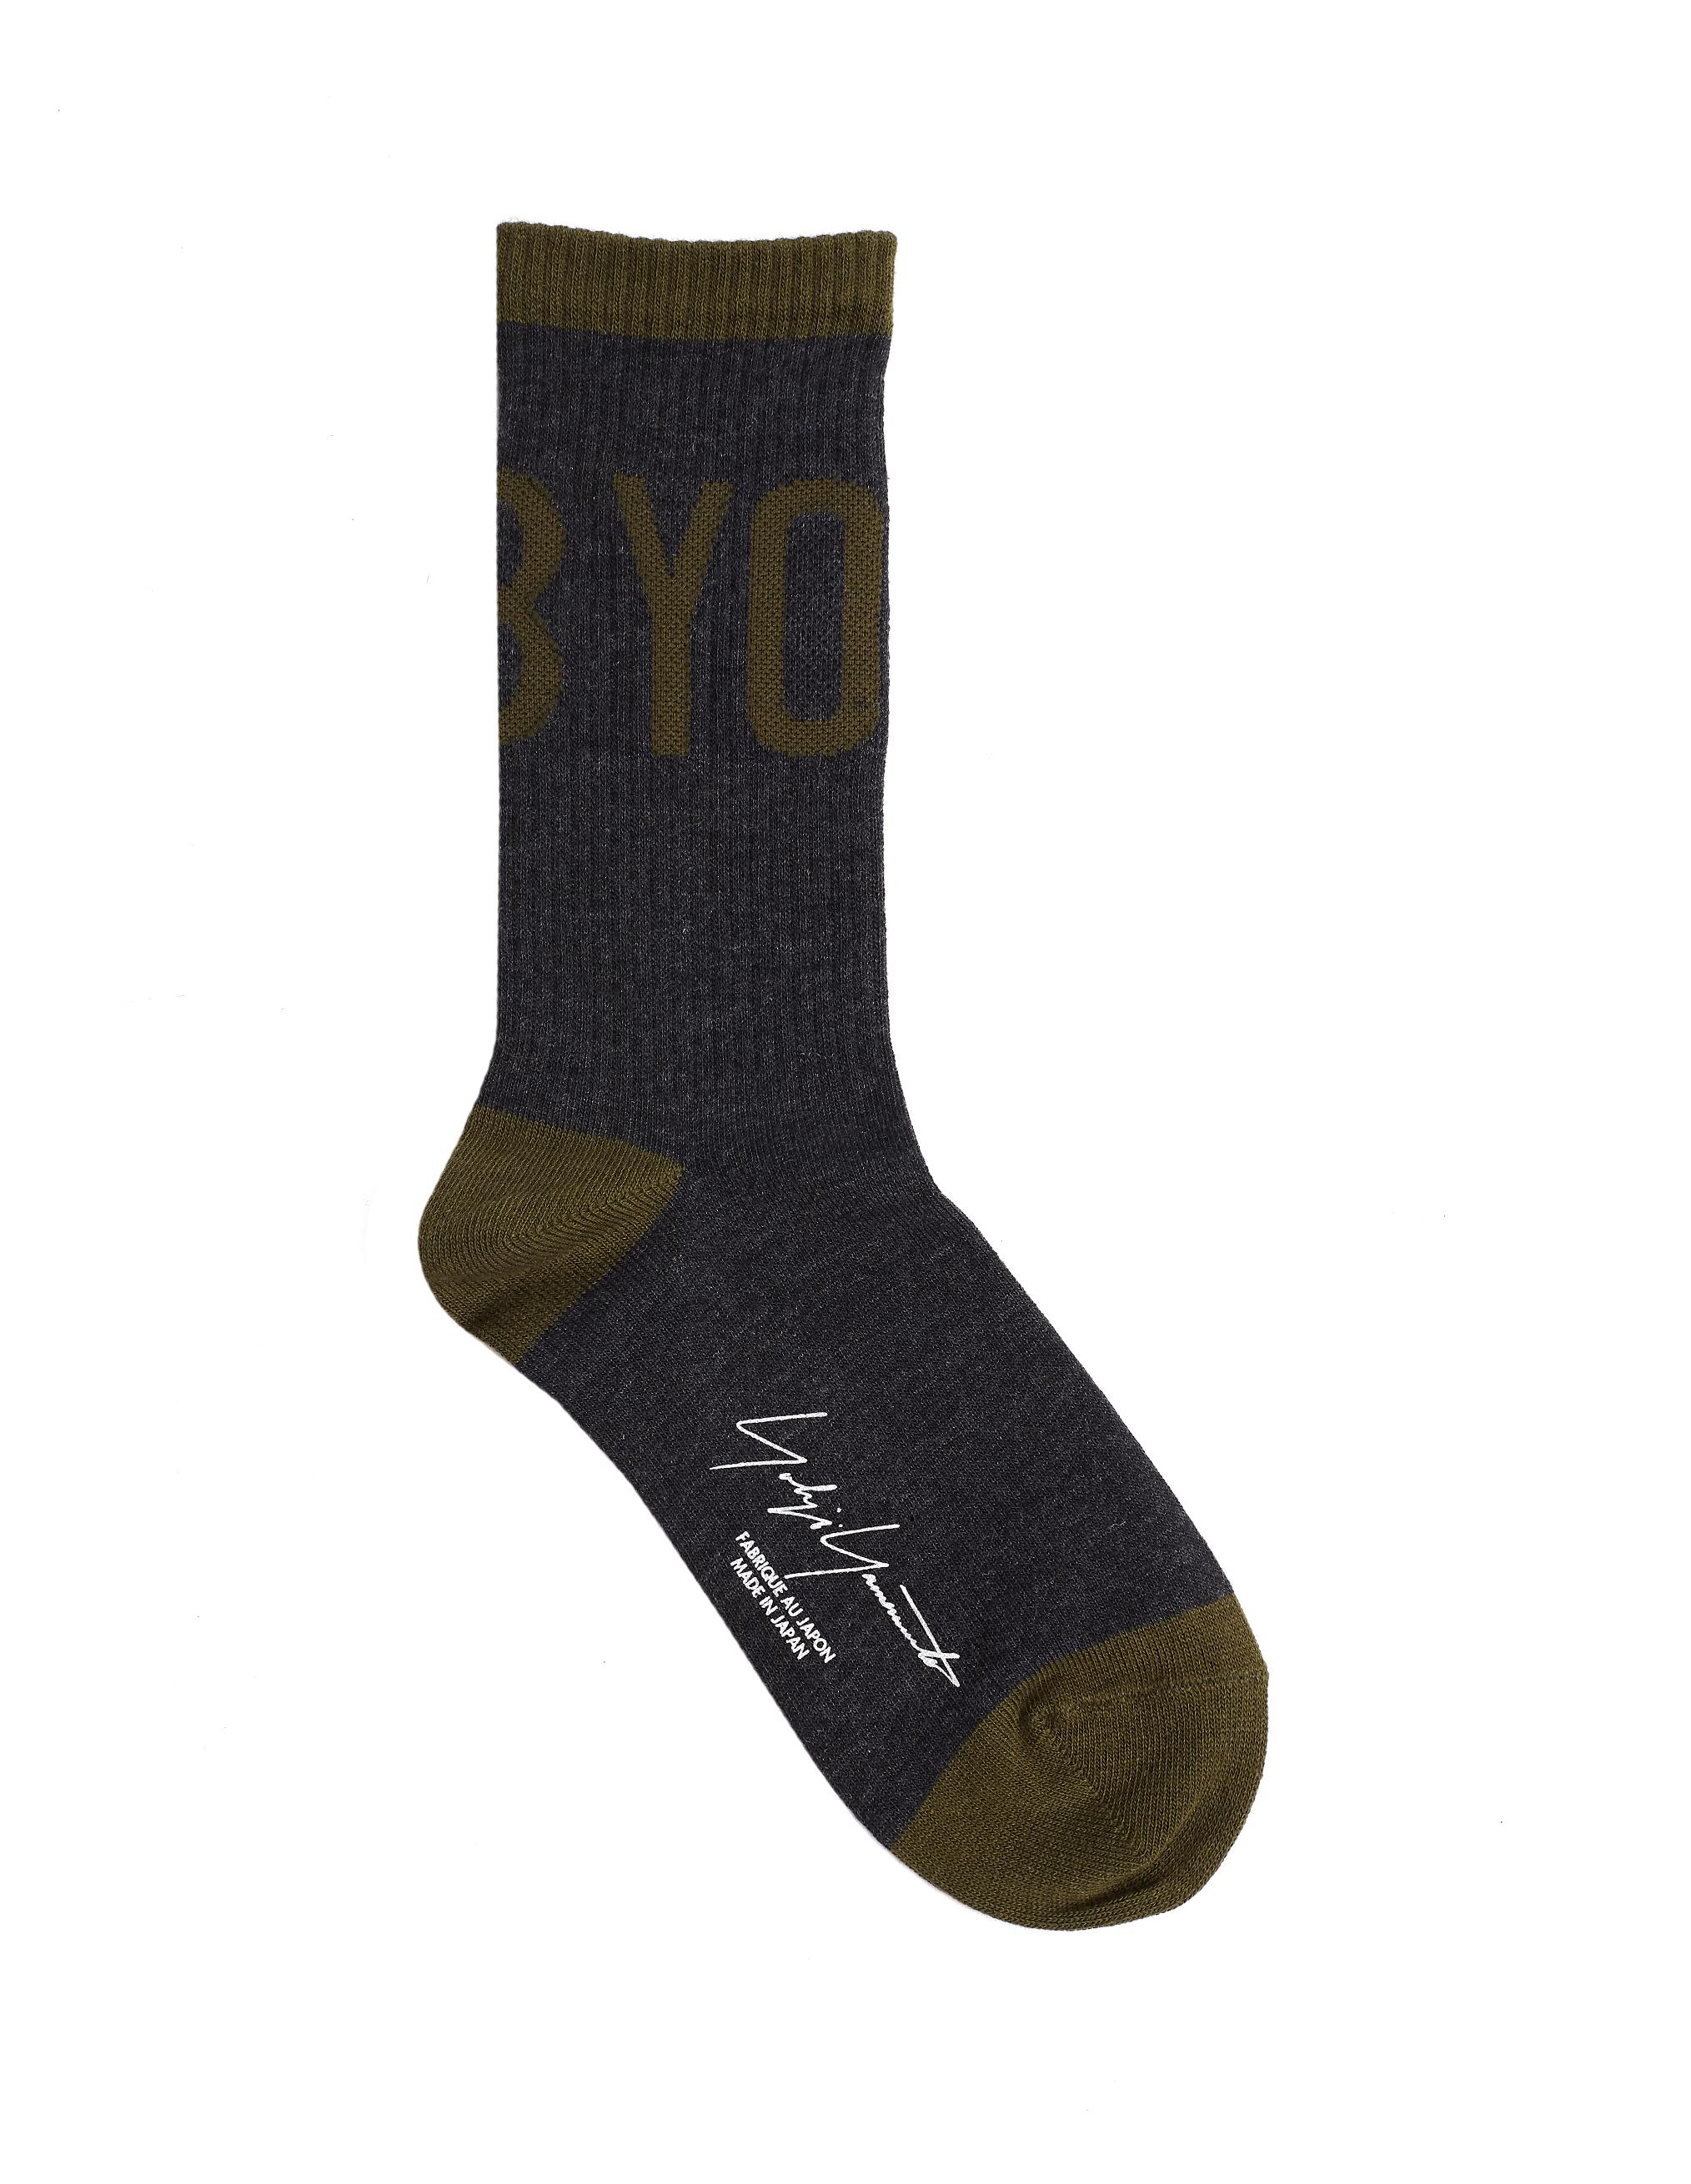 Yohji Yamamoto Grey Cotton Socks